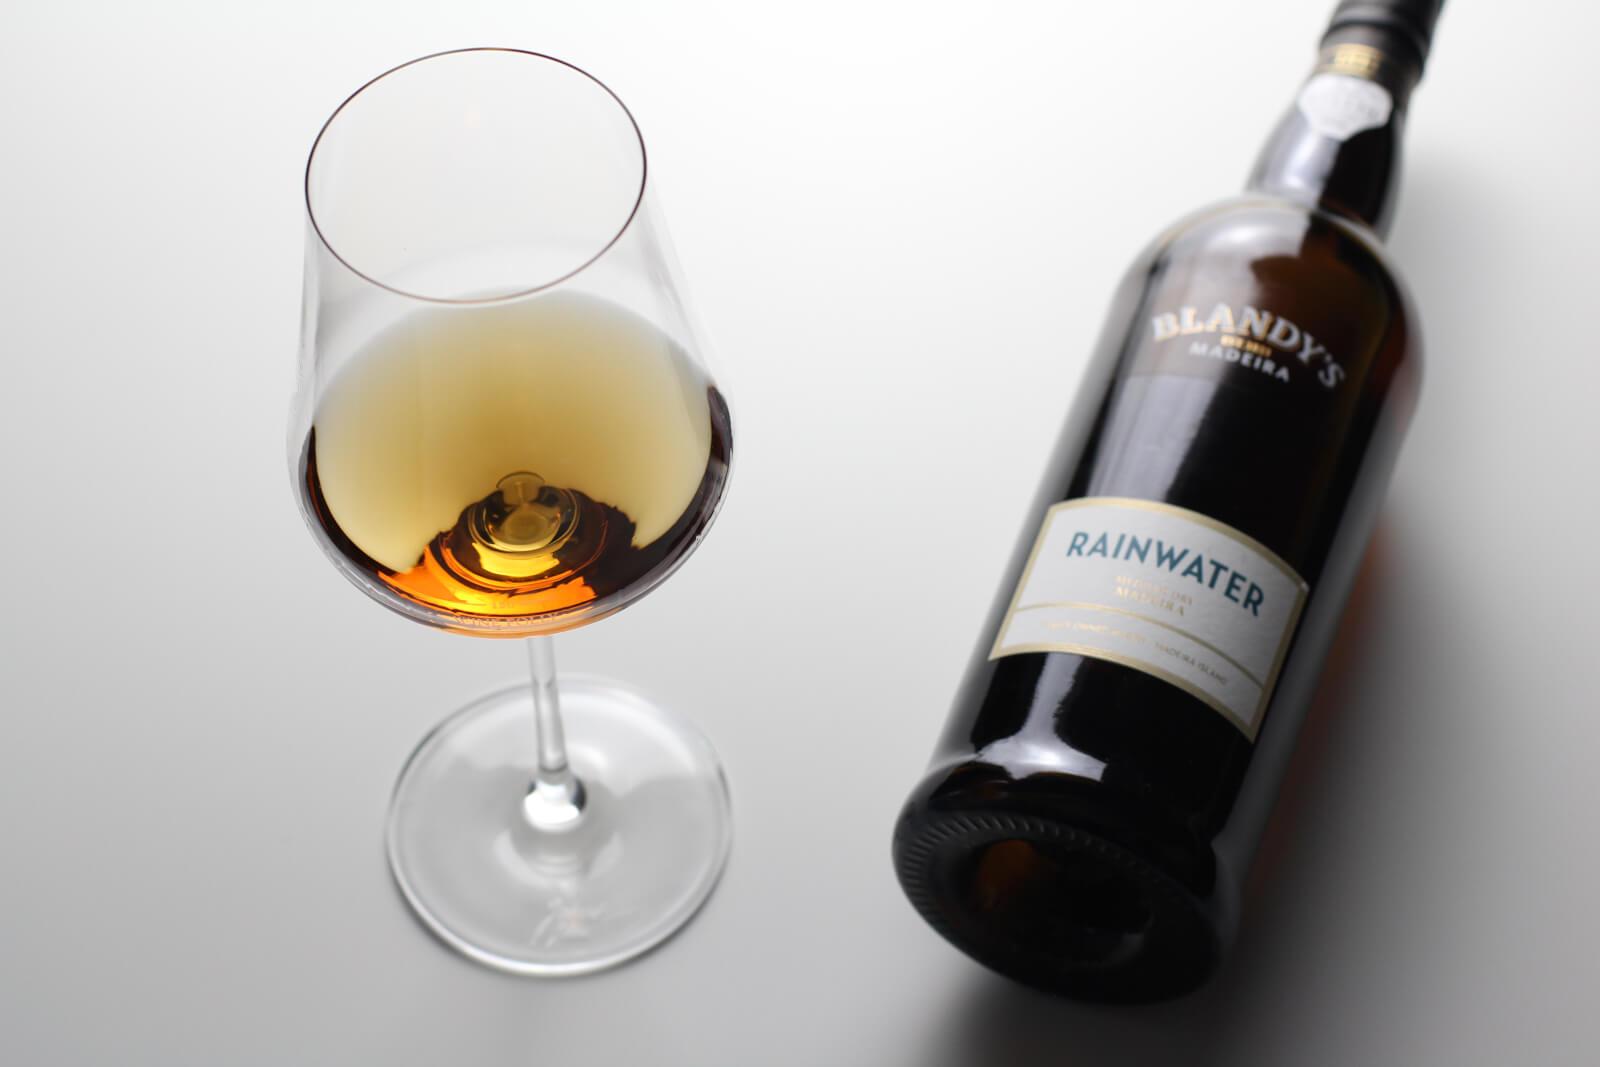 Rainwater-Madeira-Wine-In-Glass-Blandys-WineFolly